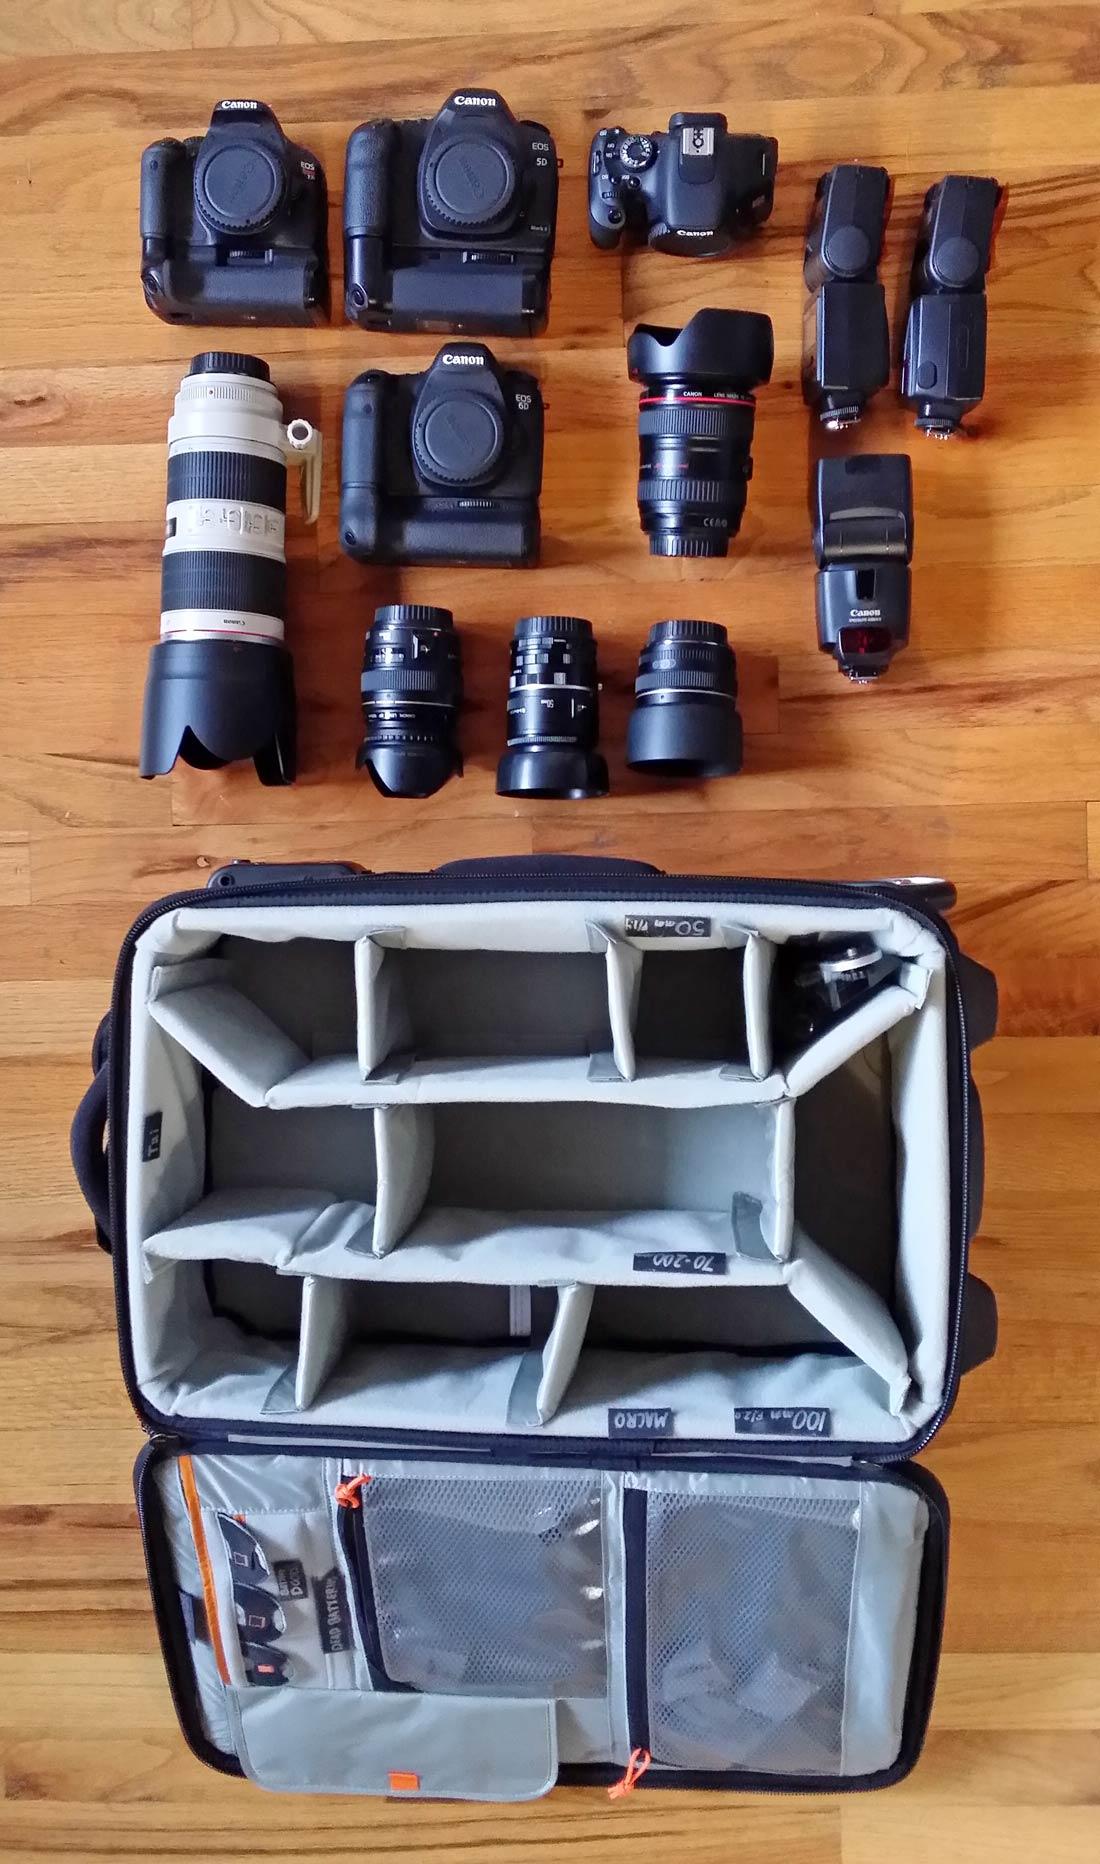 Photo Case Lowepro Pro Roller X200 Review